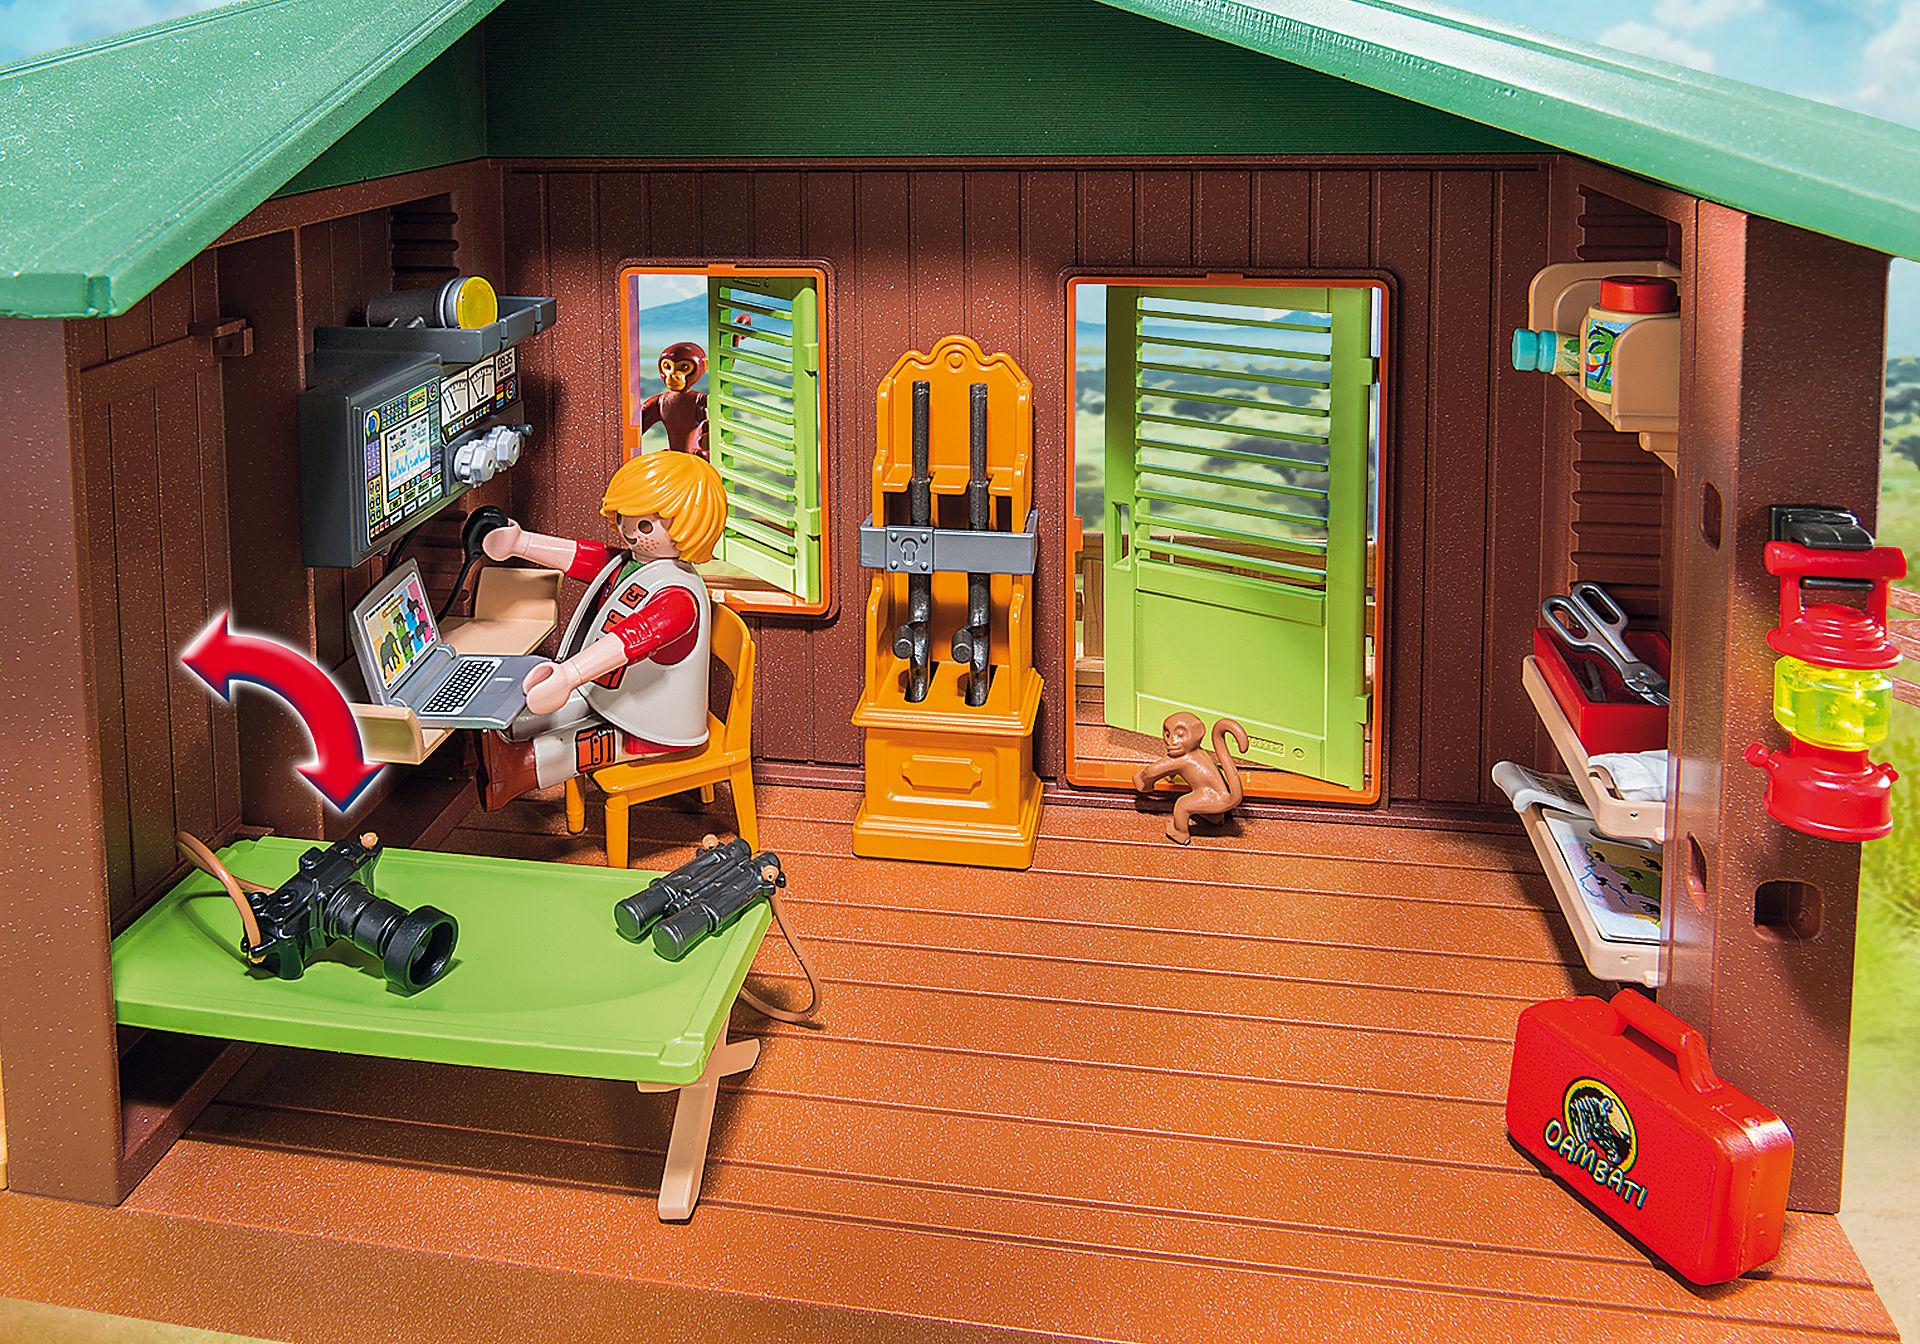 http://media.playmobil.com/i/playmobil/6936_product_extra2/Rangerstation mit Tieraufzucht